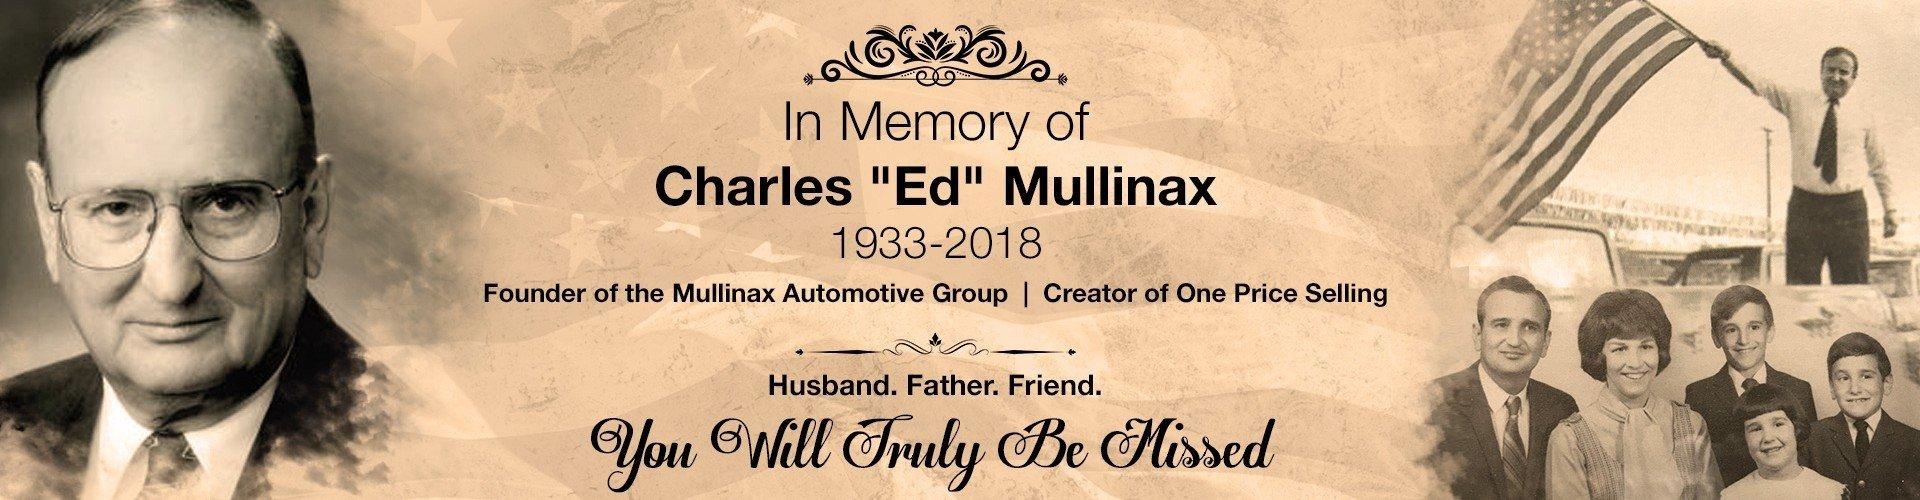 Ed Mullinax Tribute